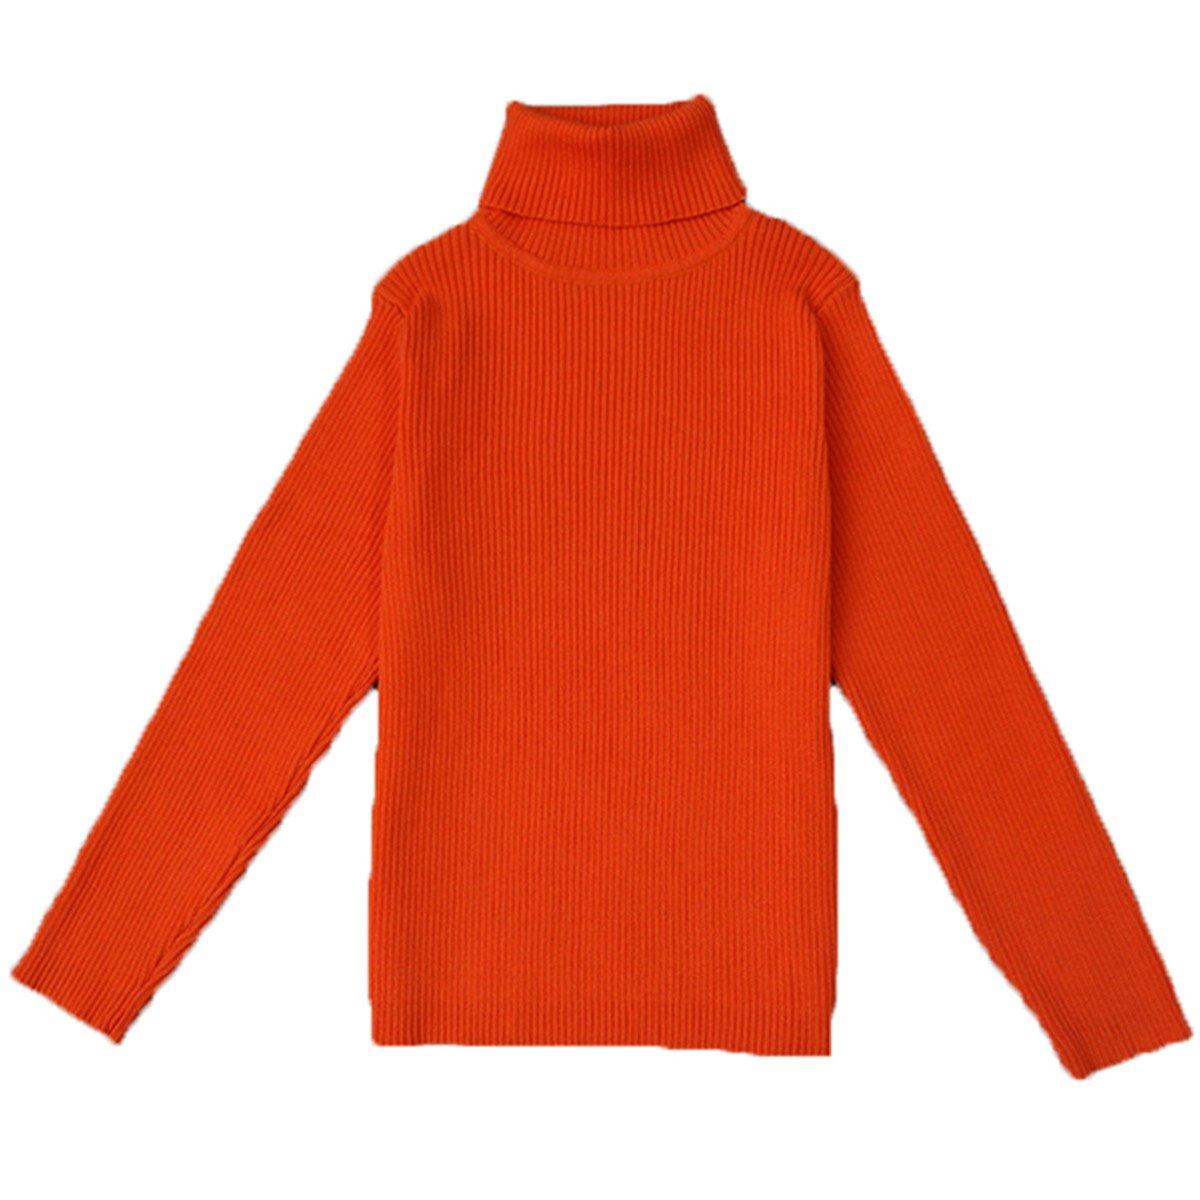 JELEUON Little Kids Girls Long Sleeve Sweater Sweaters High Neck Ruflle Fine Knit Sweatshirt Pullover